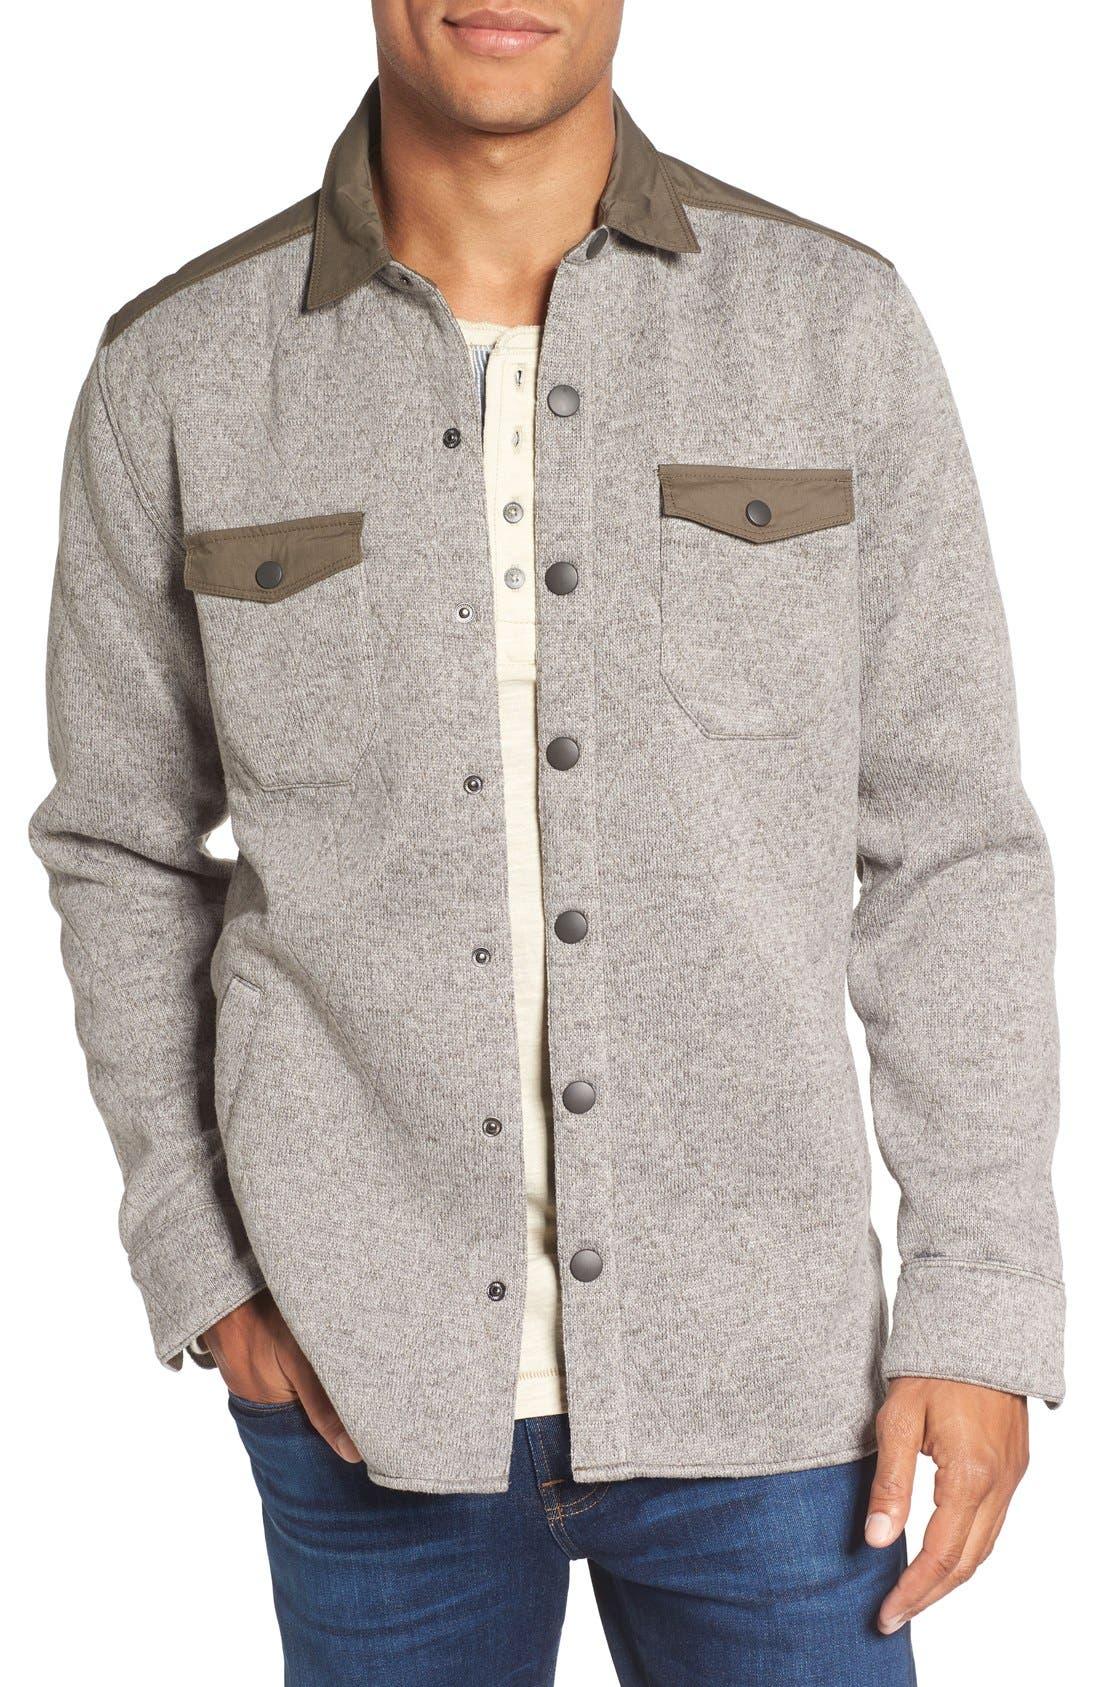 Main Image - Jeremiah Quilted Fleece Shirt Jacket